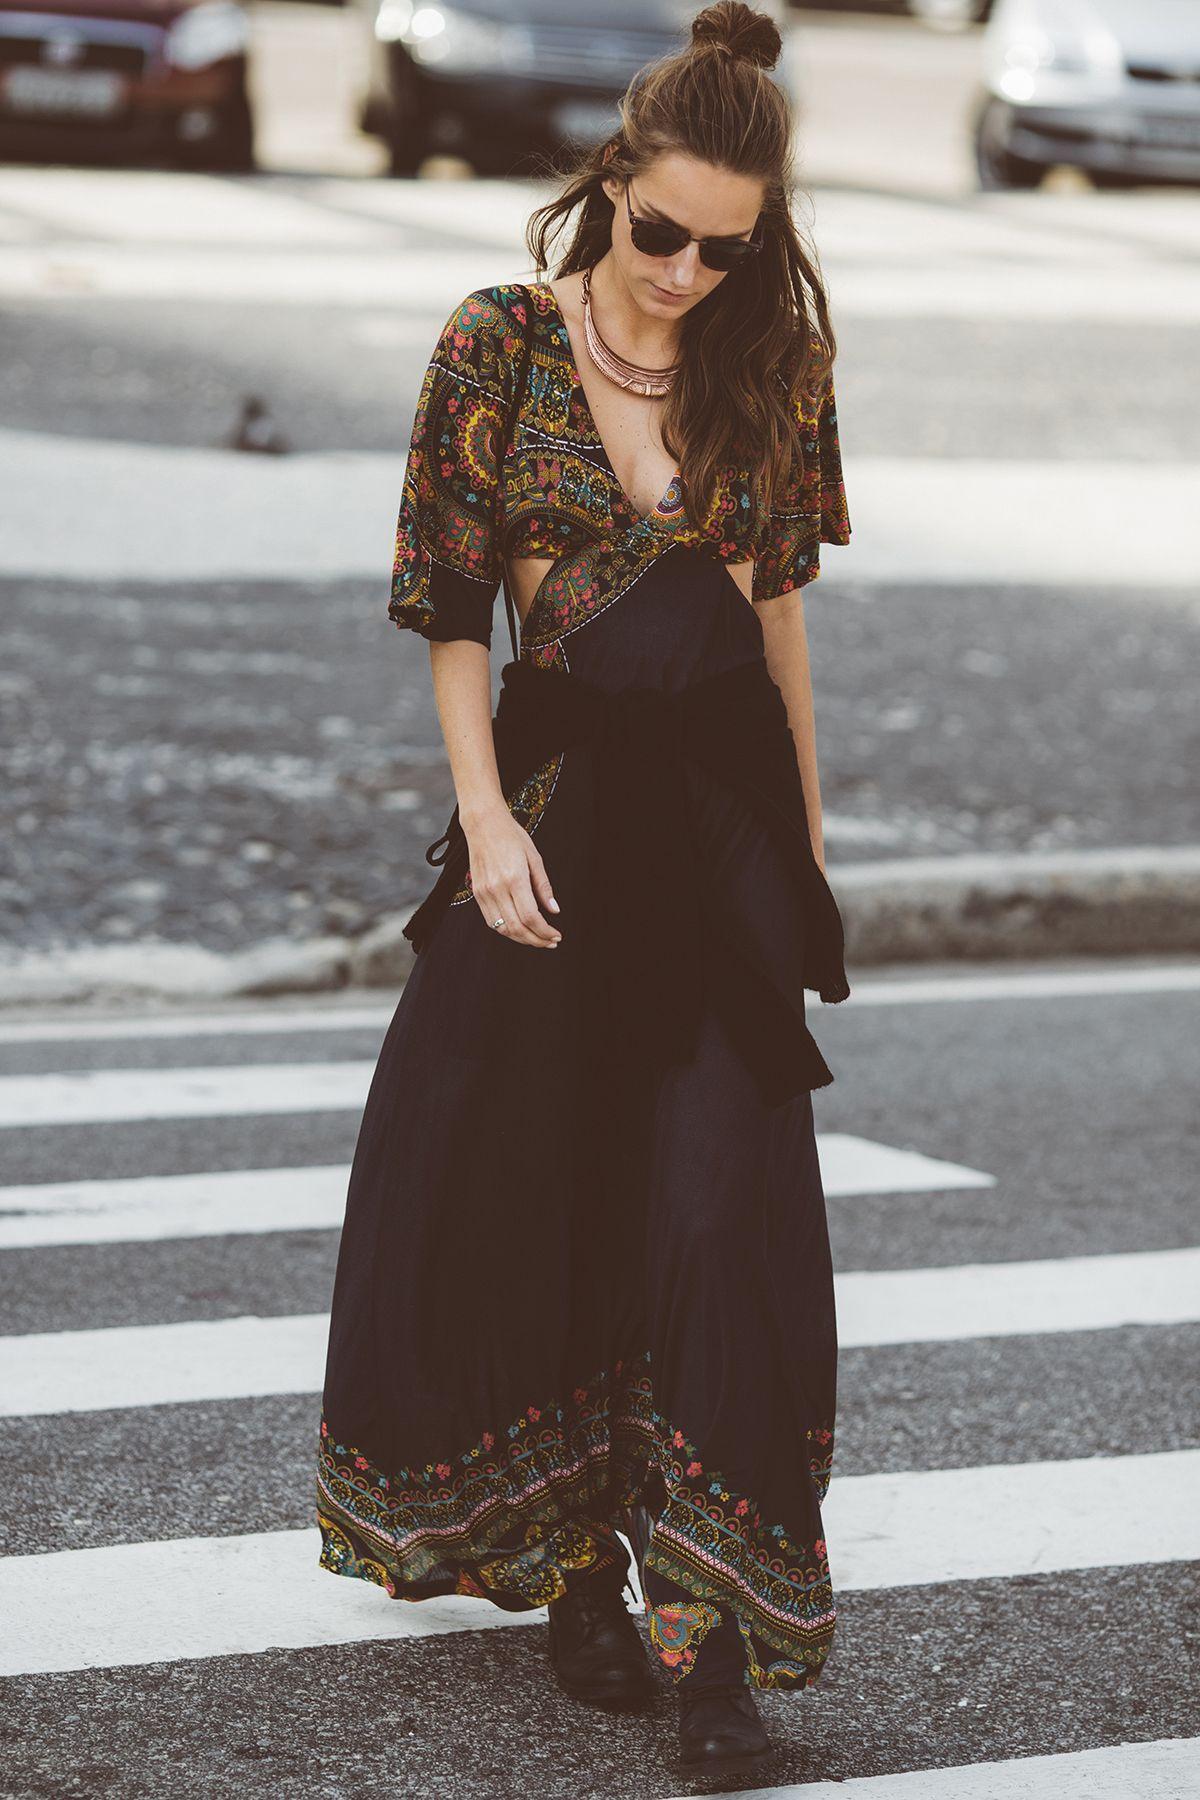 Resultado de imagem para vestido hippie street style